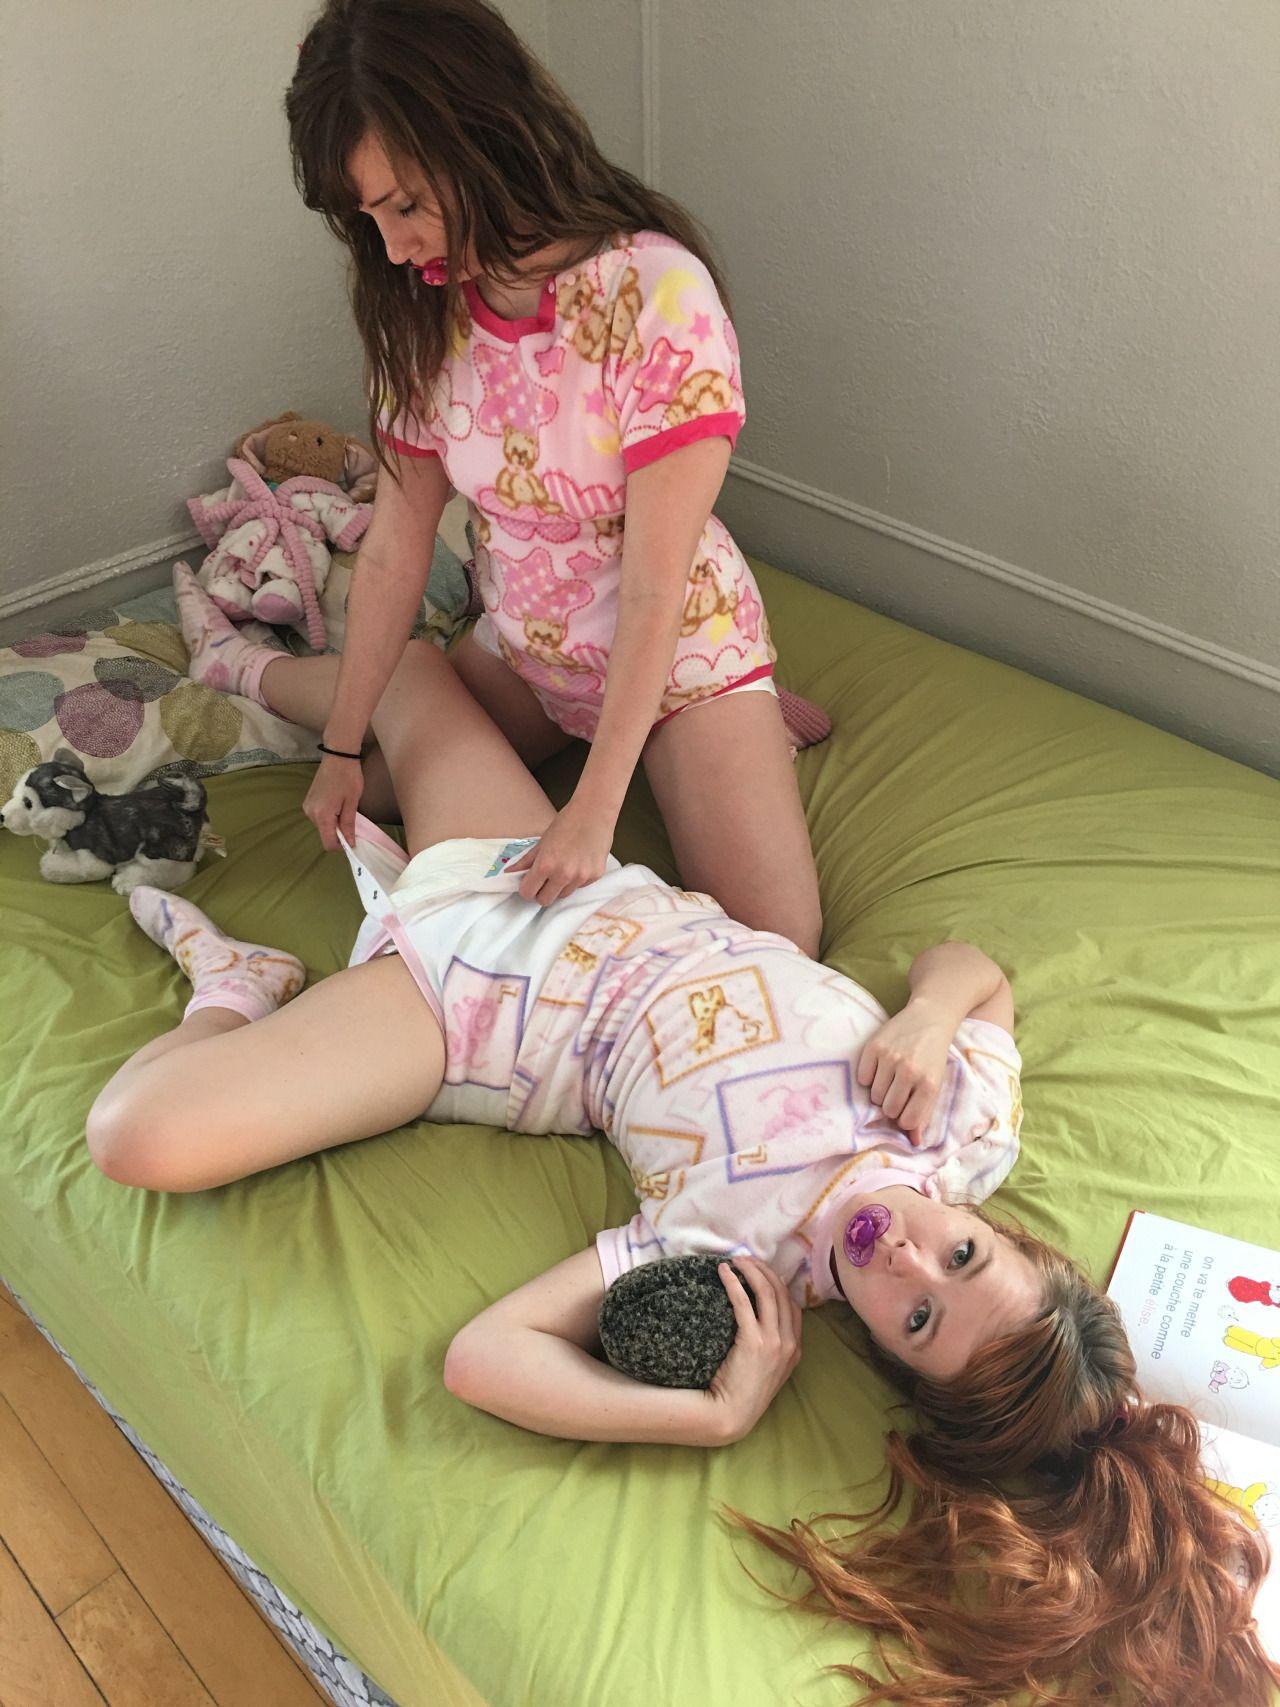 Teen models hot pussy